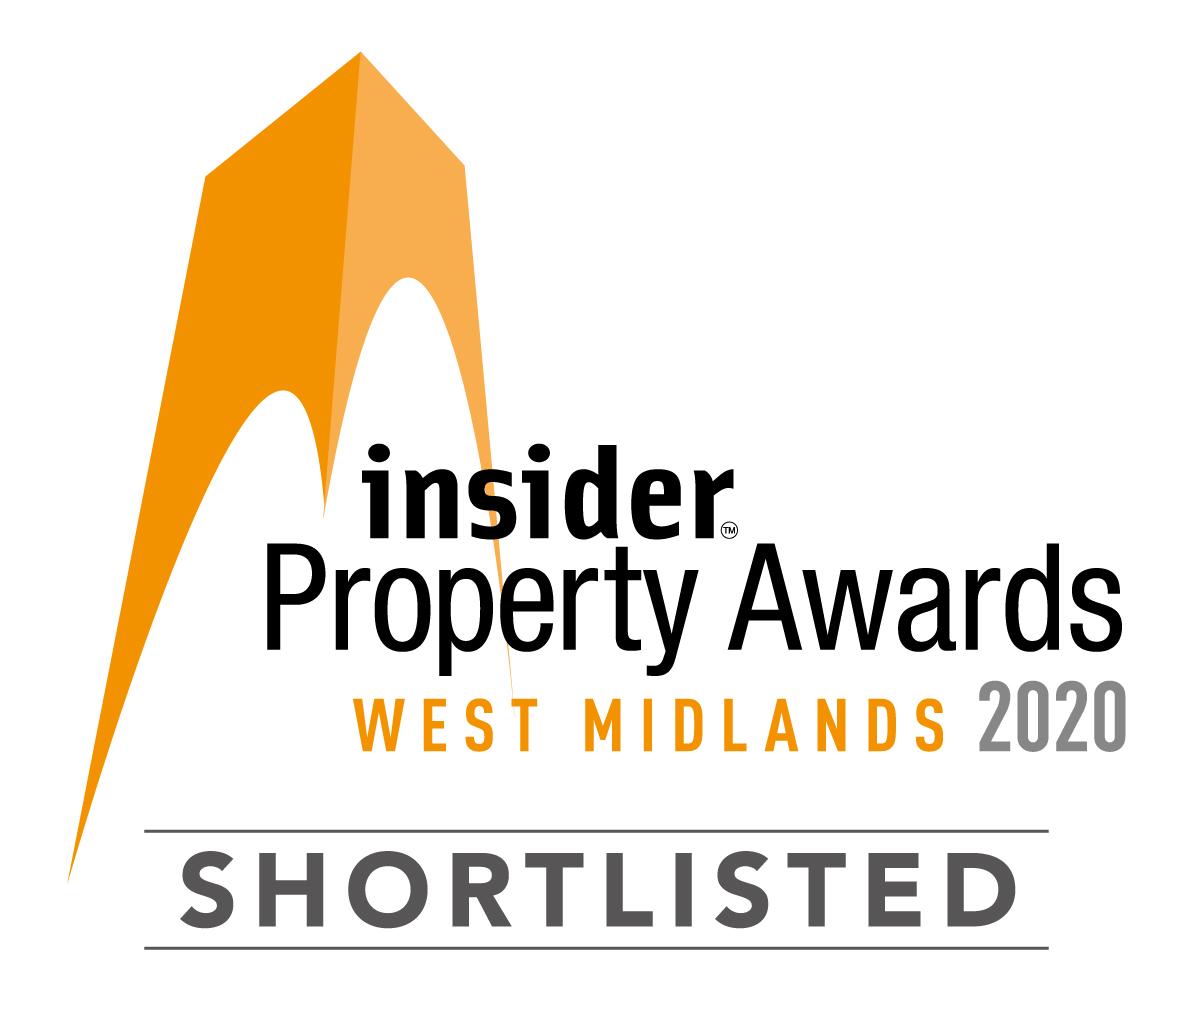 Insider Property awards